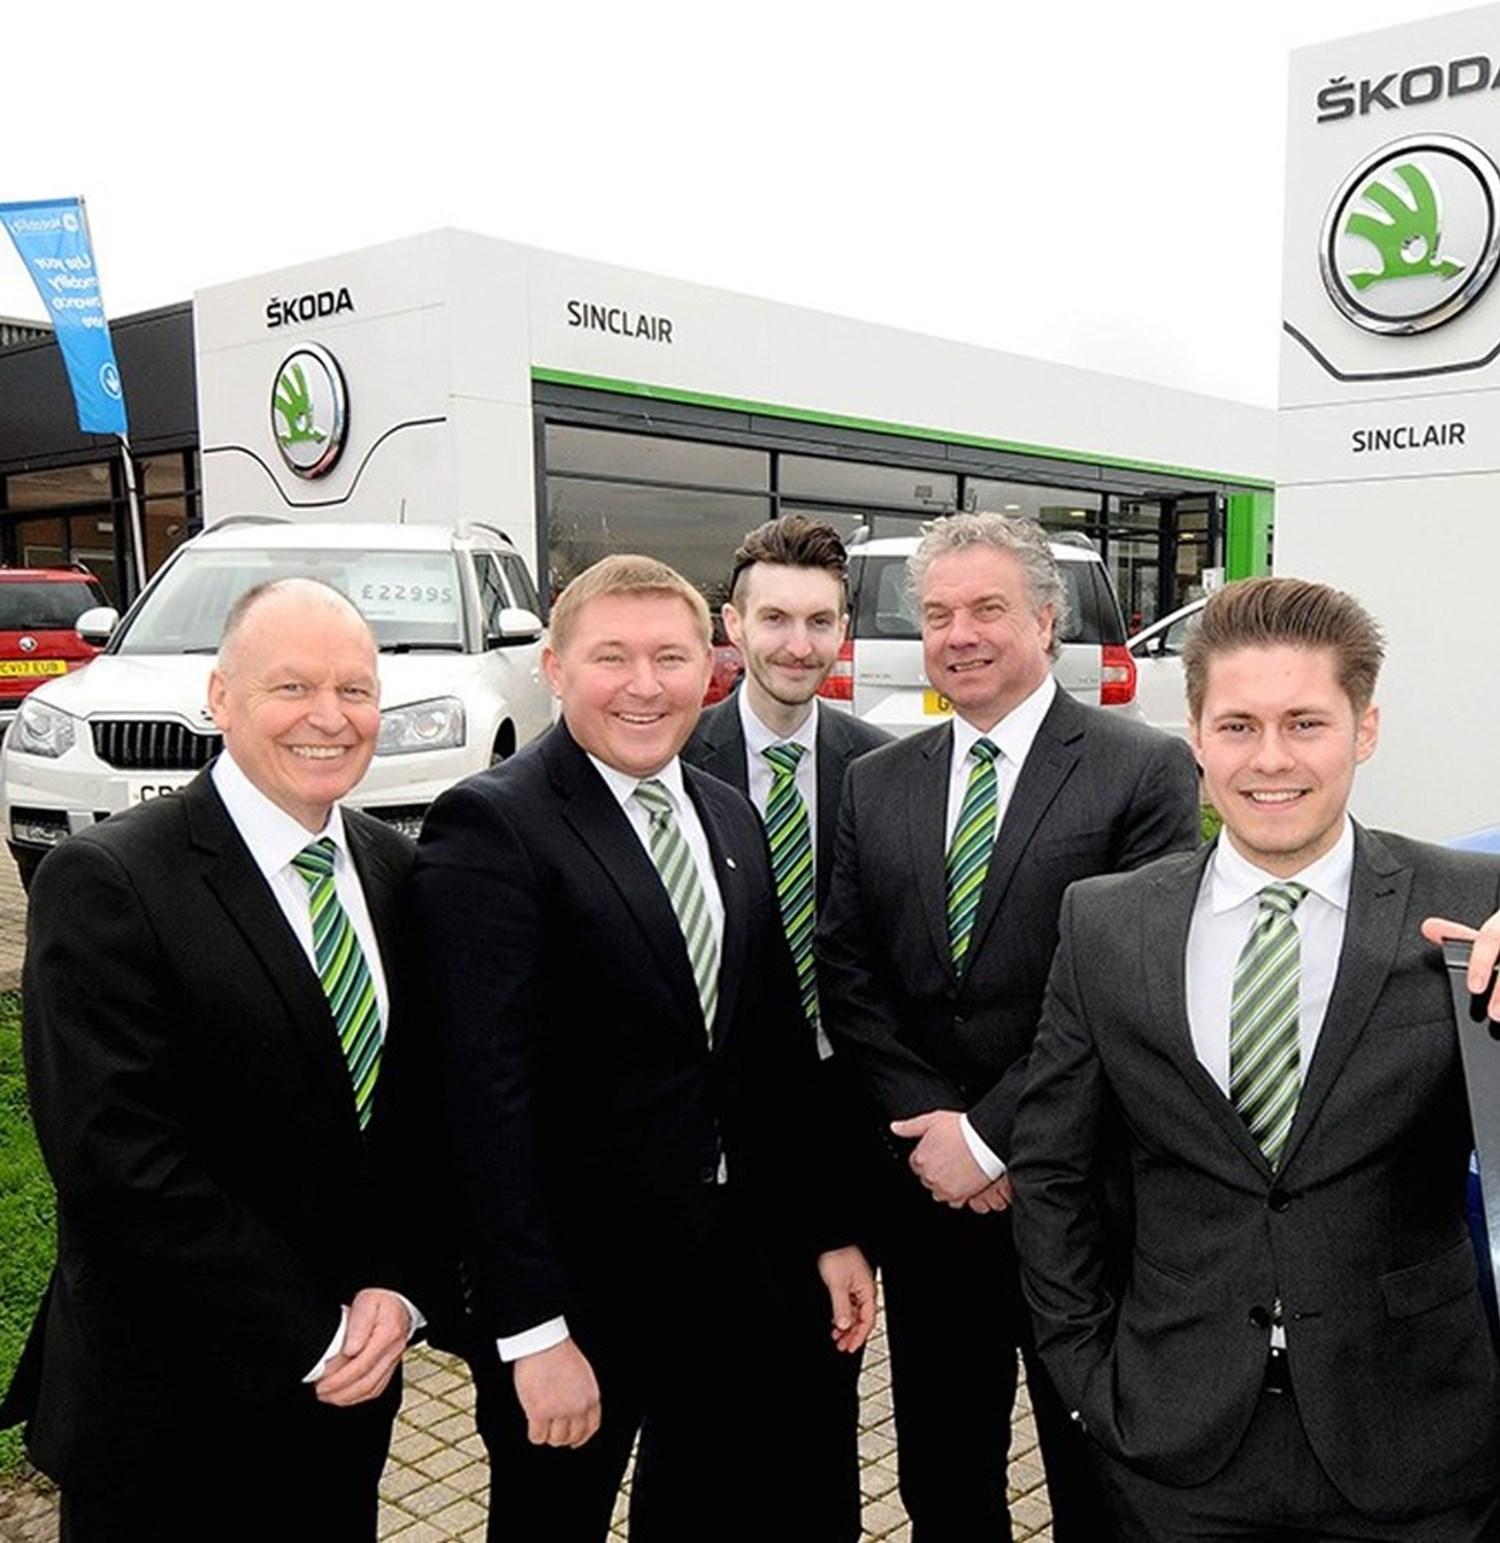 Skoda Sinclair team